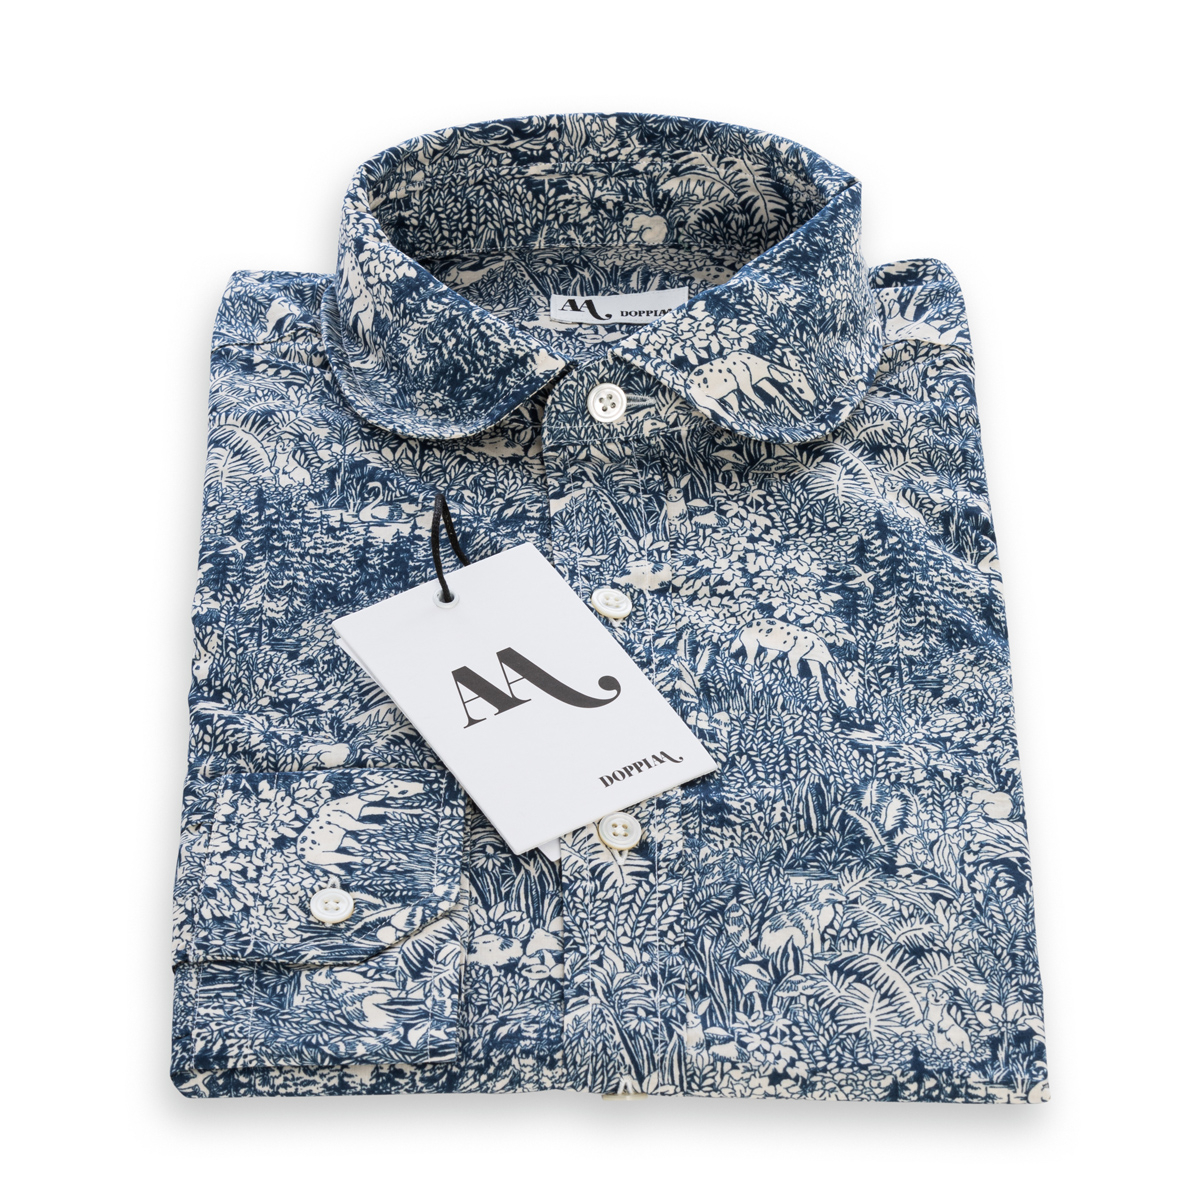 Camicia Doppiaa Aamberes Fantasia Blu